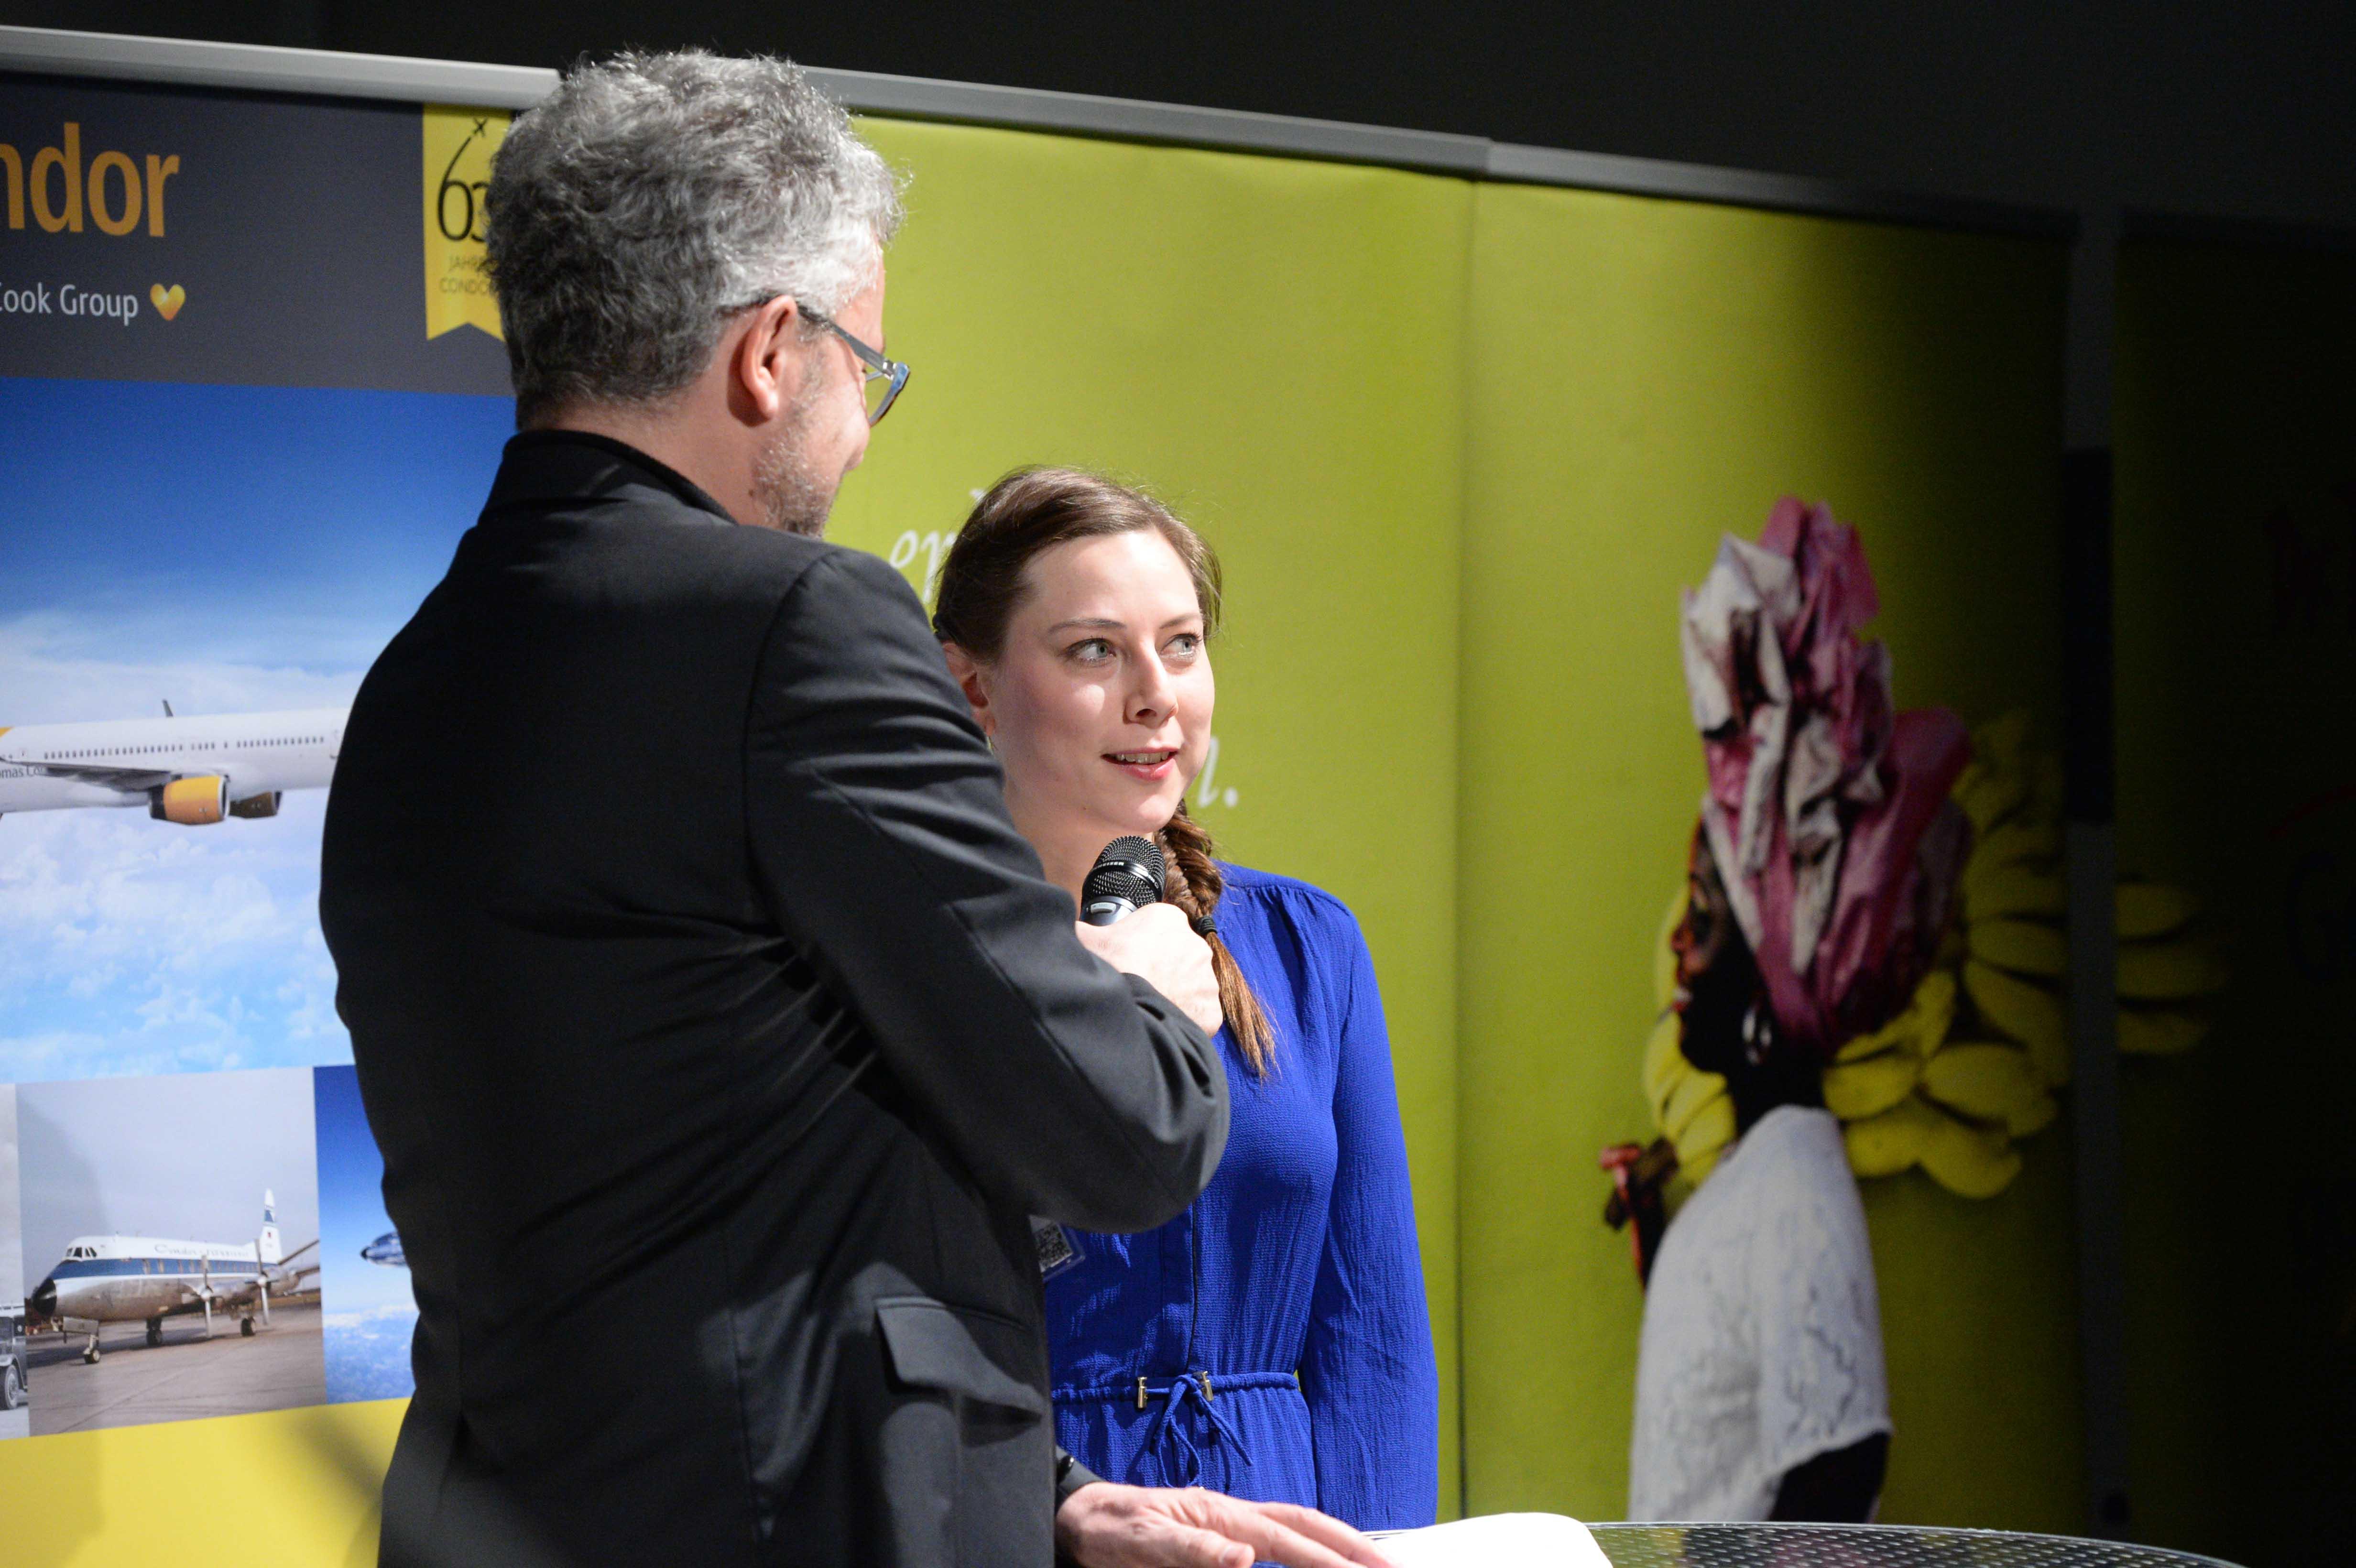 Columbus Film Preisverleihung 2015 Silber Ines Seiter BR Talk mit Thomas Radler web